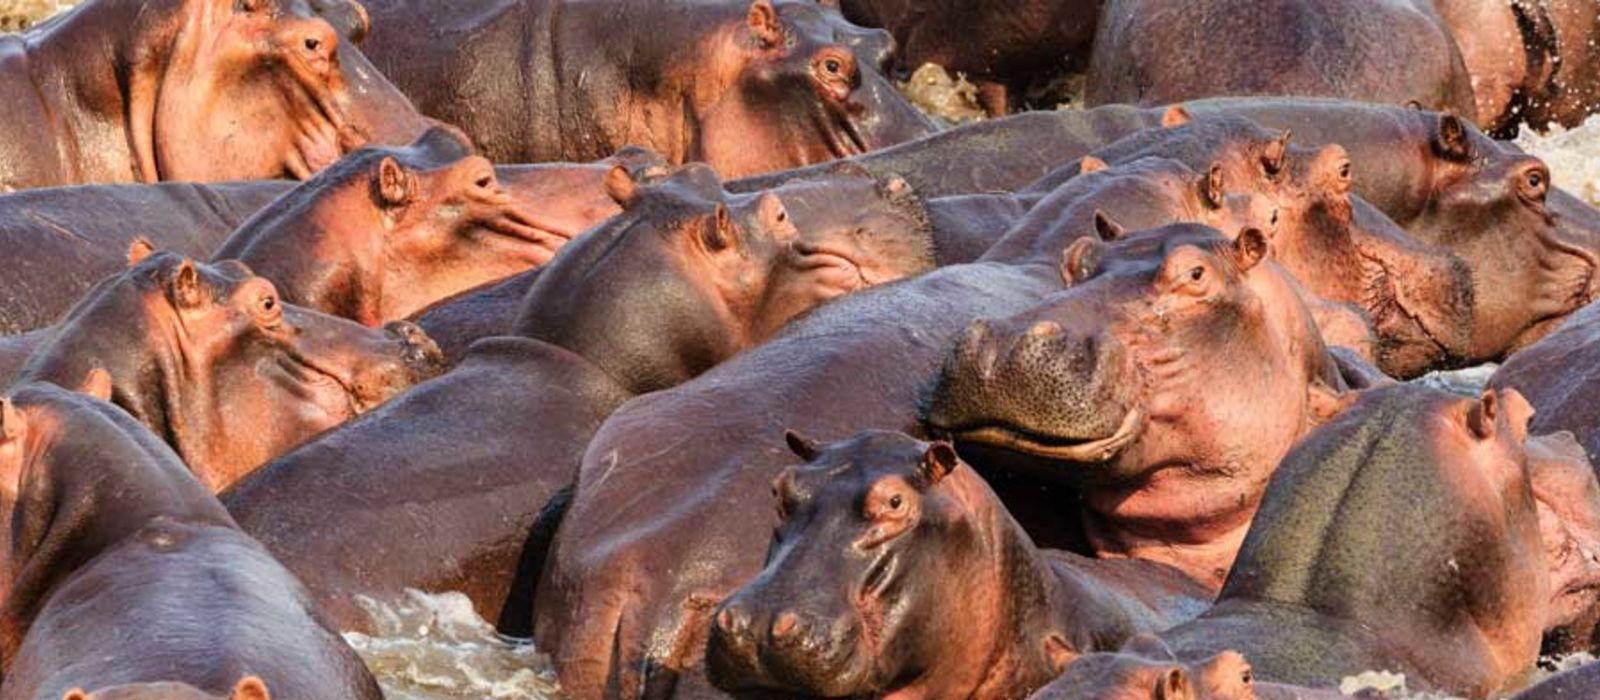 Malawi, Sambia und Mosambik: Safari, Malawisee und Strand Urlaub 3